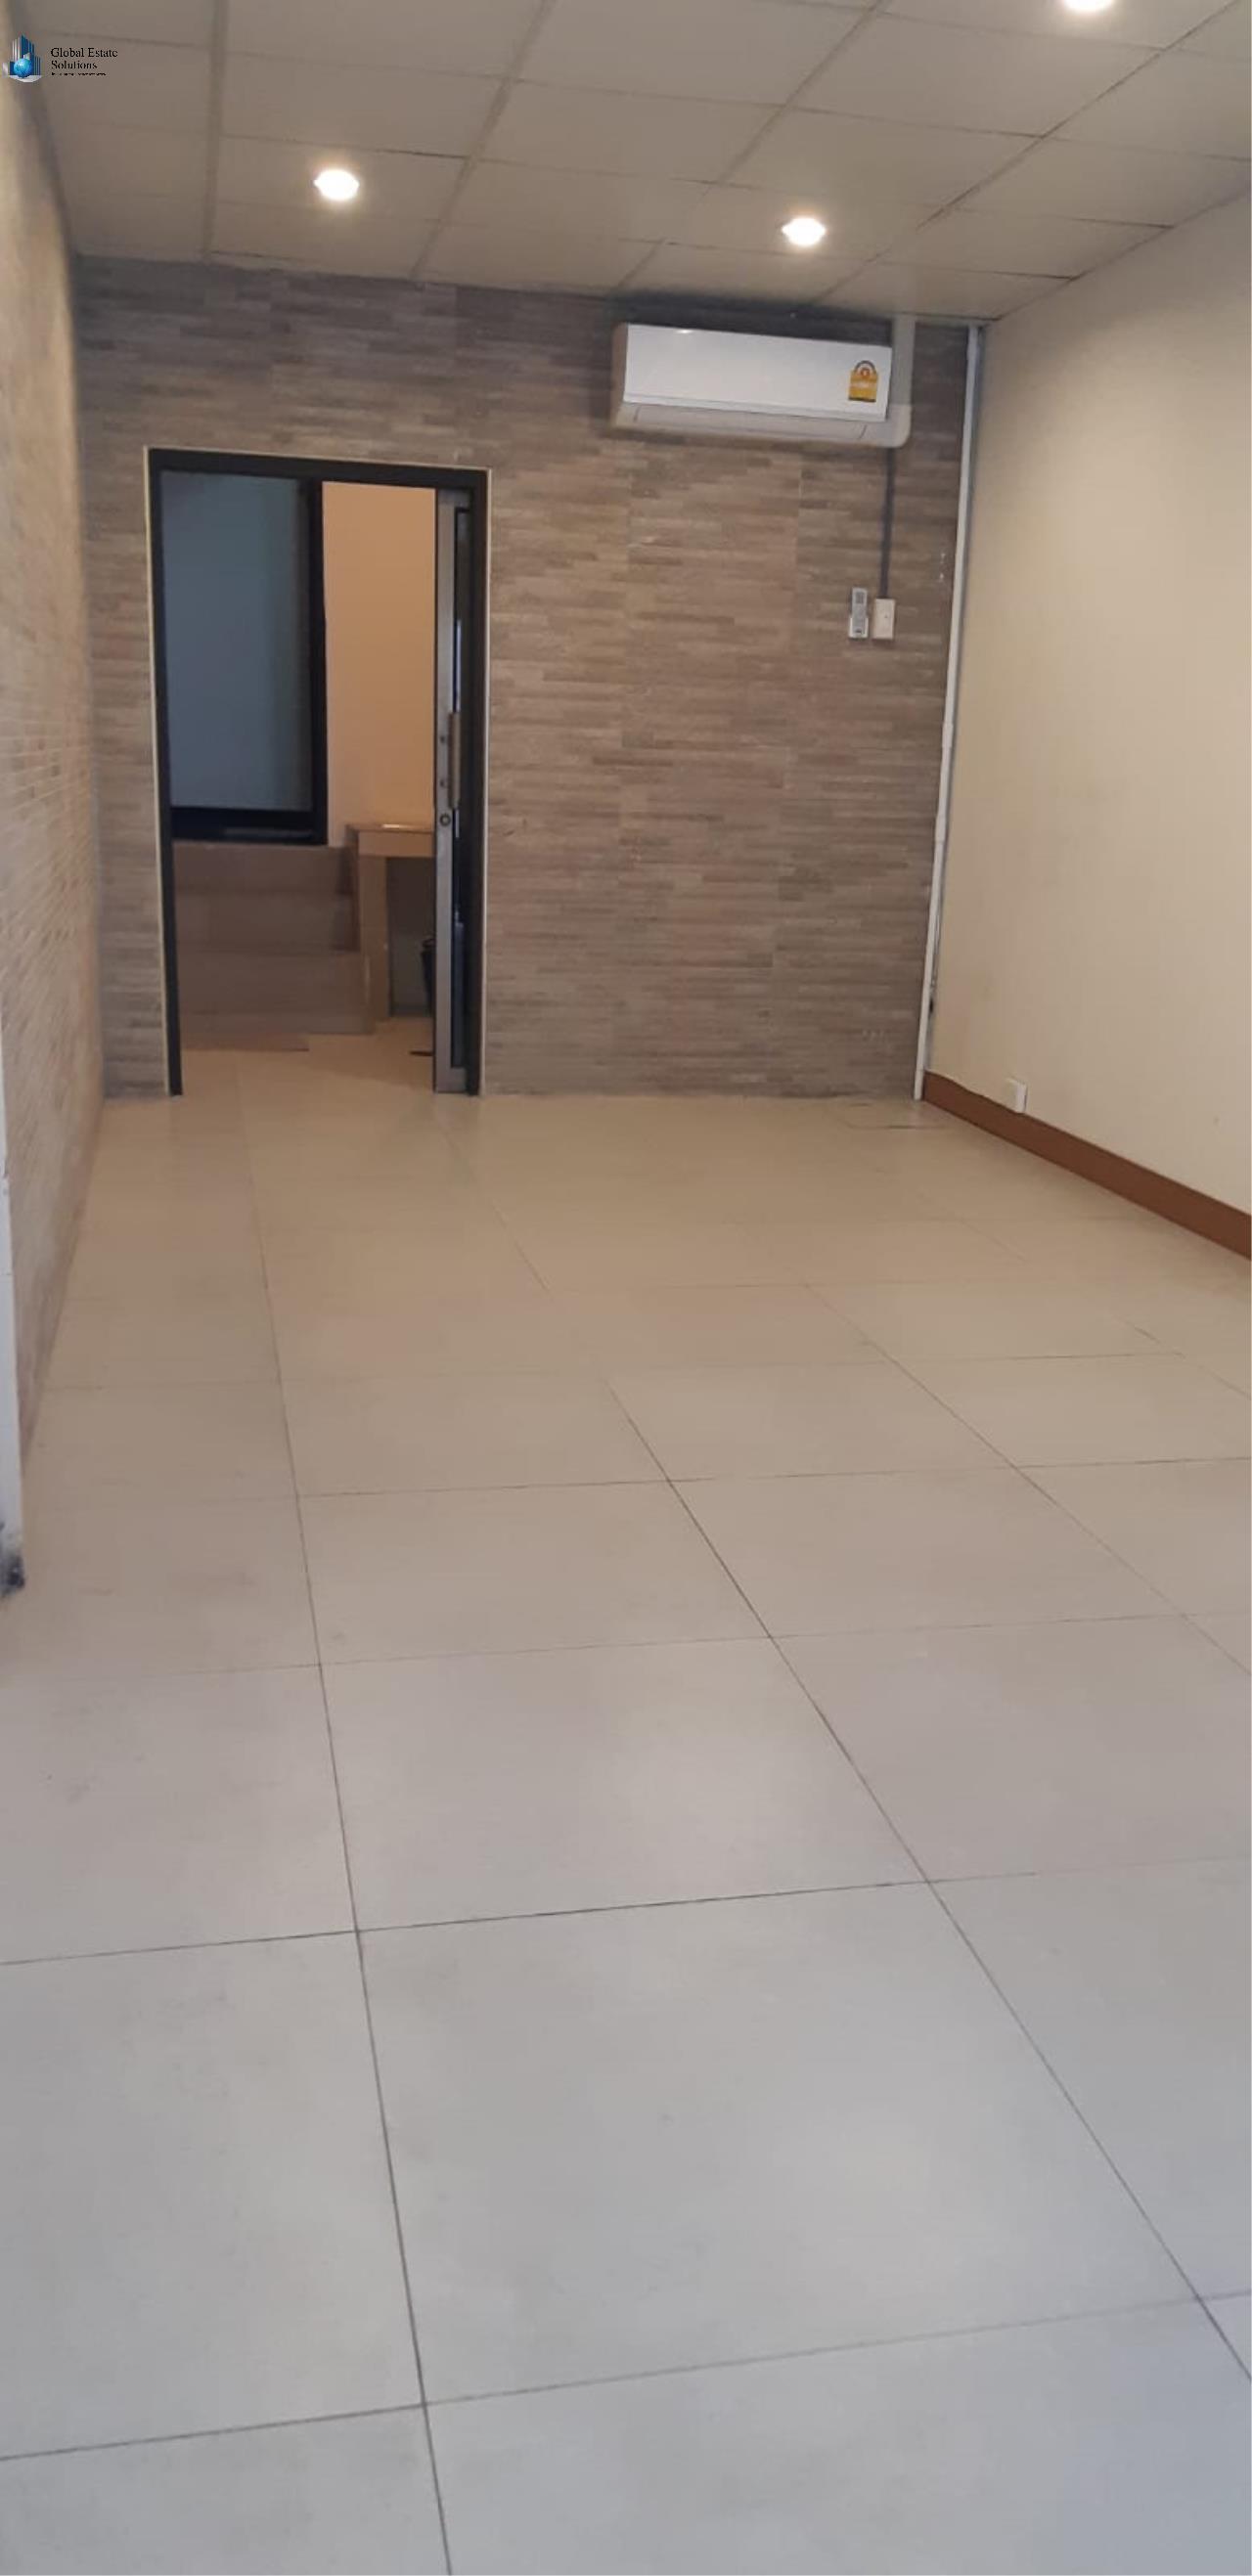 Bangkok Property Solutions Co., Ltd. Agency's Commercial Shop For Rent 4